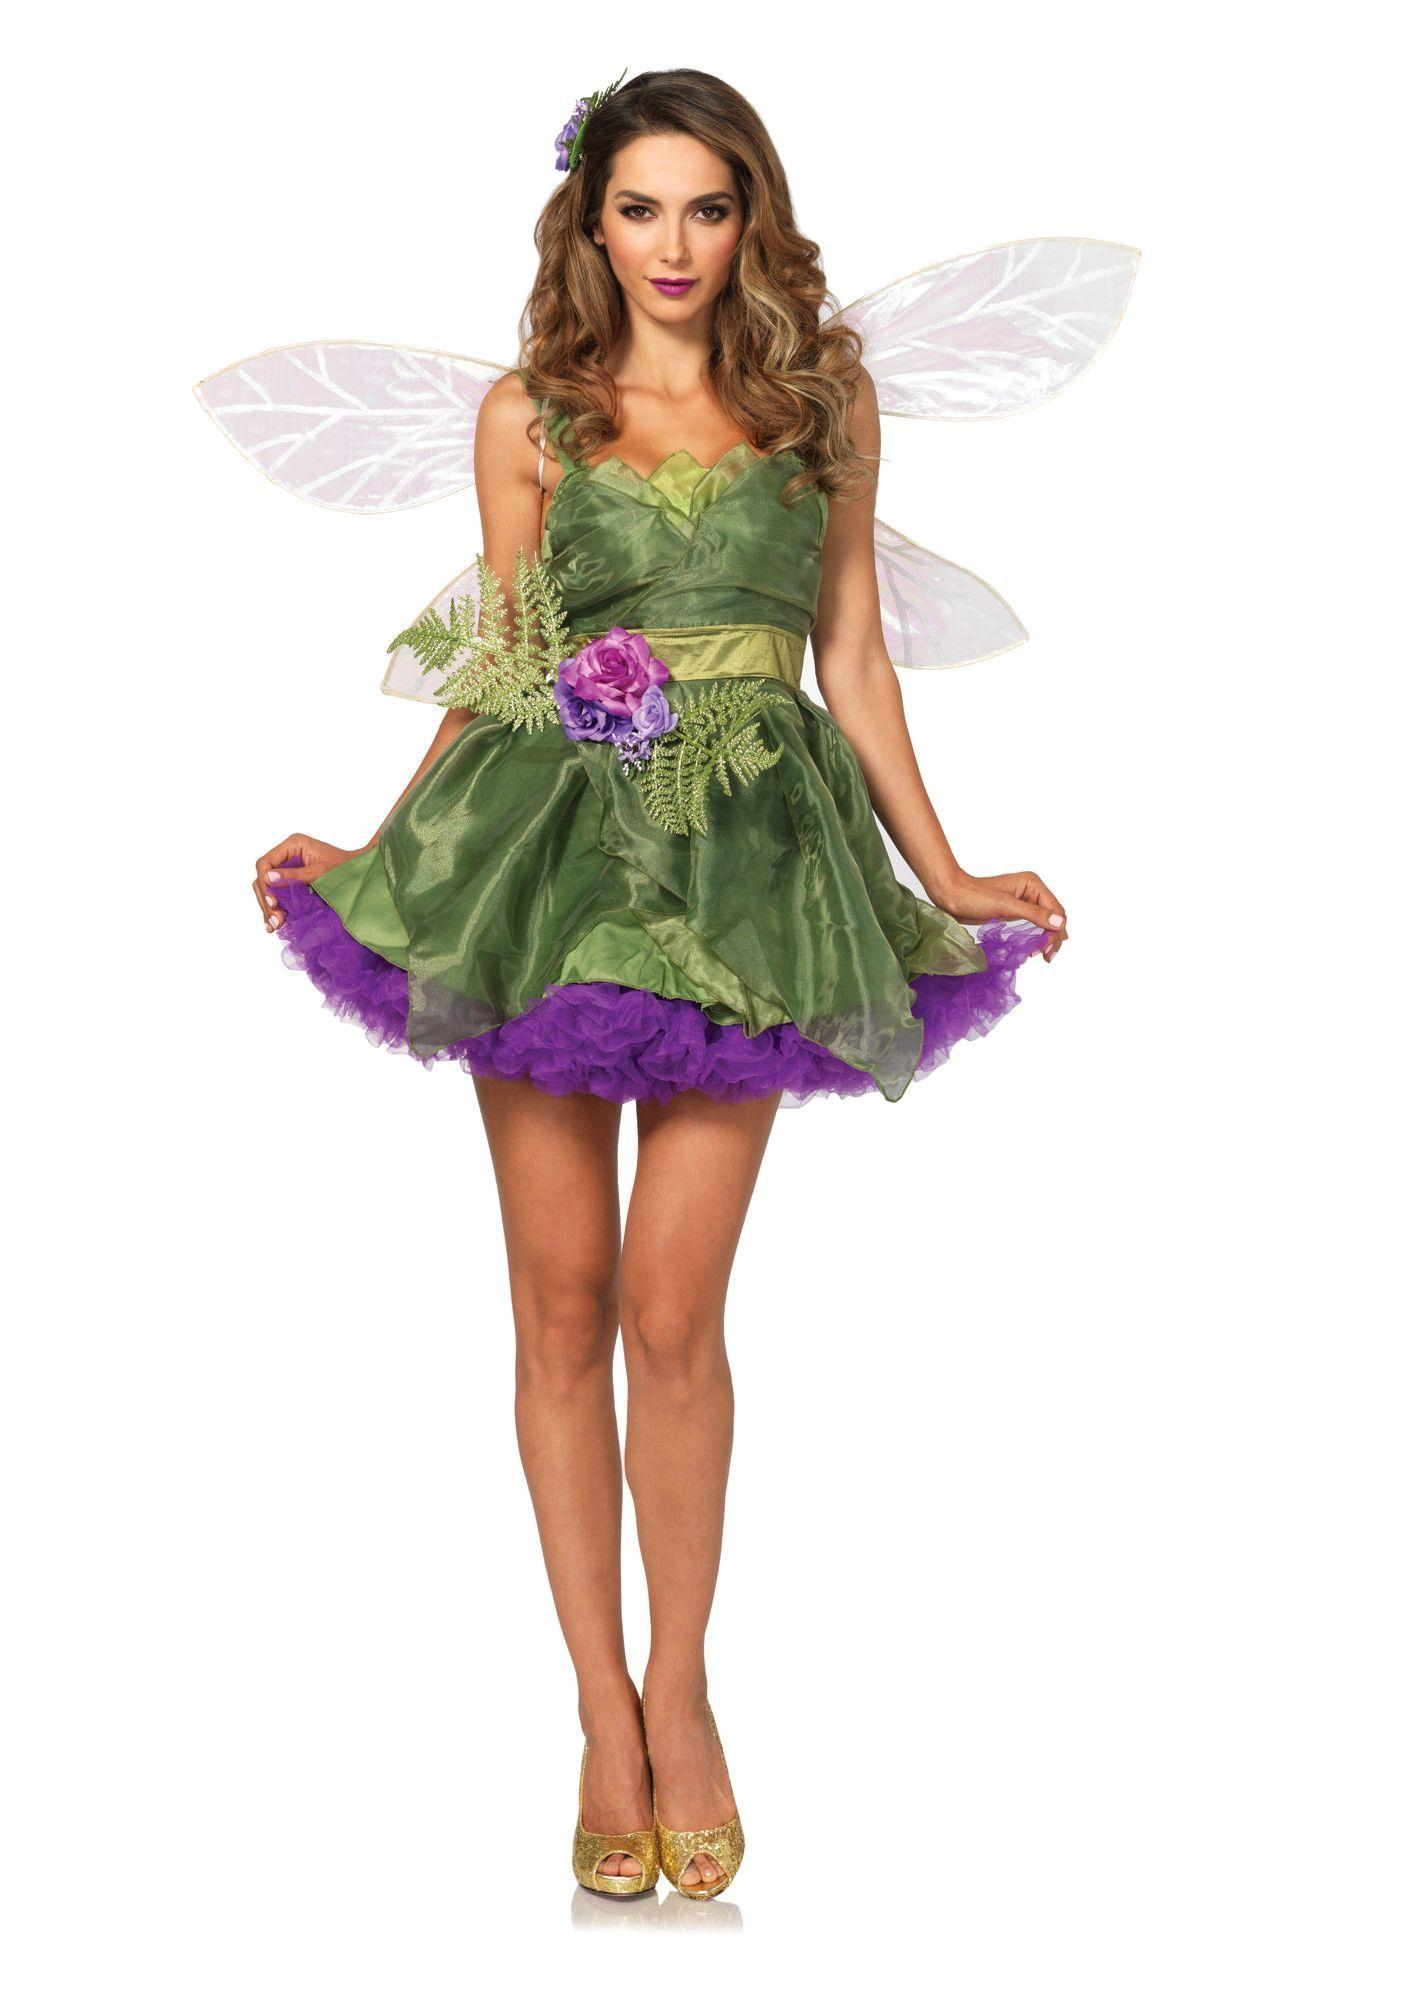 PcWoodland FairyOrganza DressWaist Sash With FlowerHair Clip